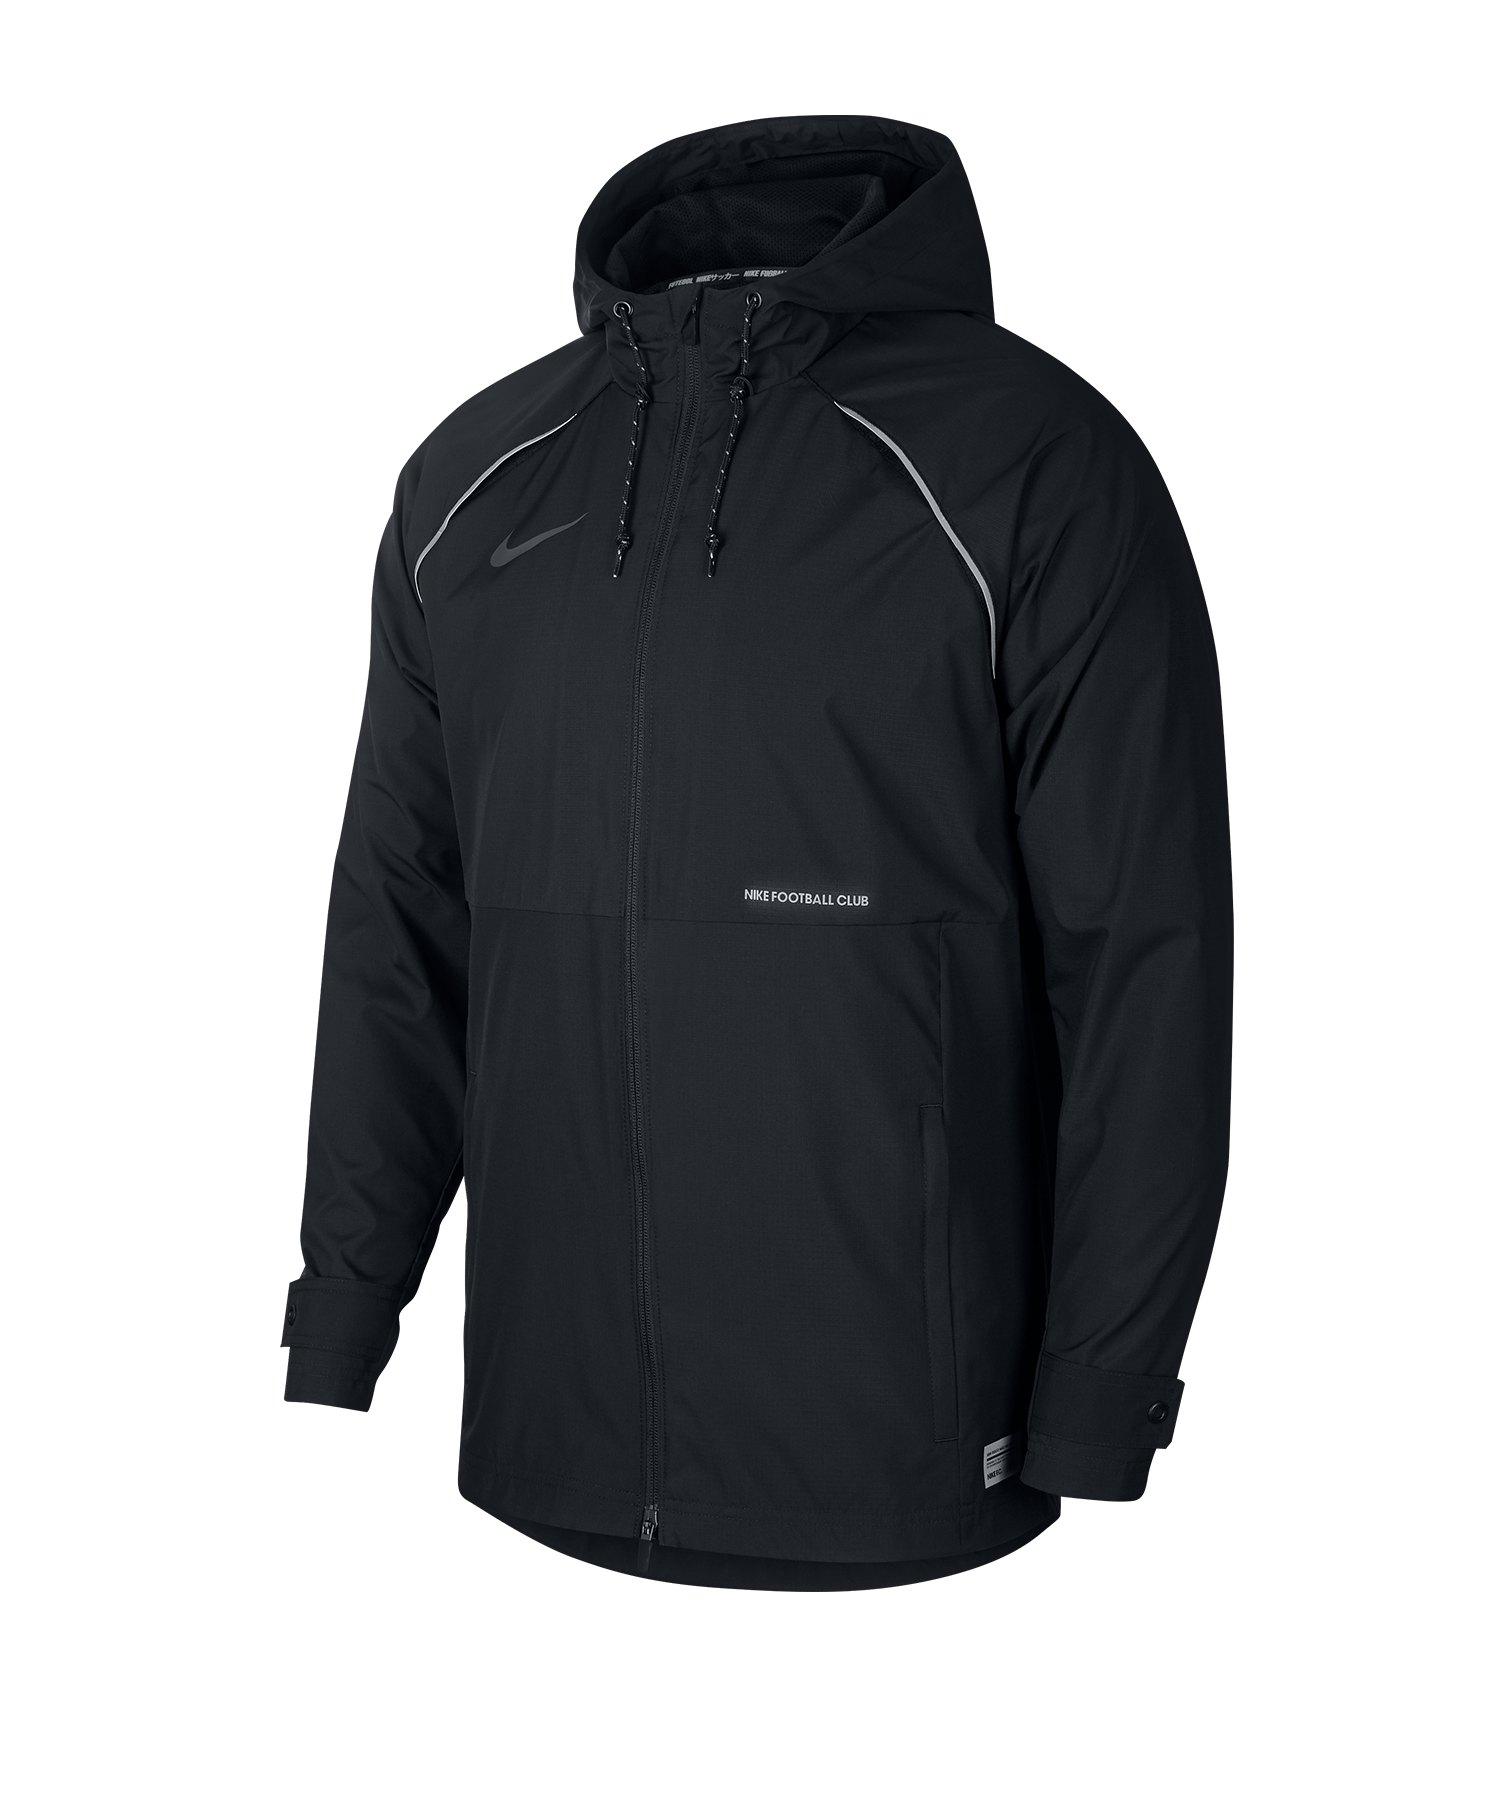 Nike F.C Allwetterjacke Schwarz F010 - schwarz